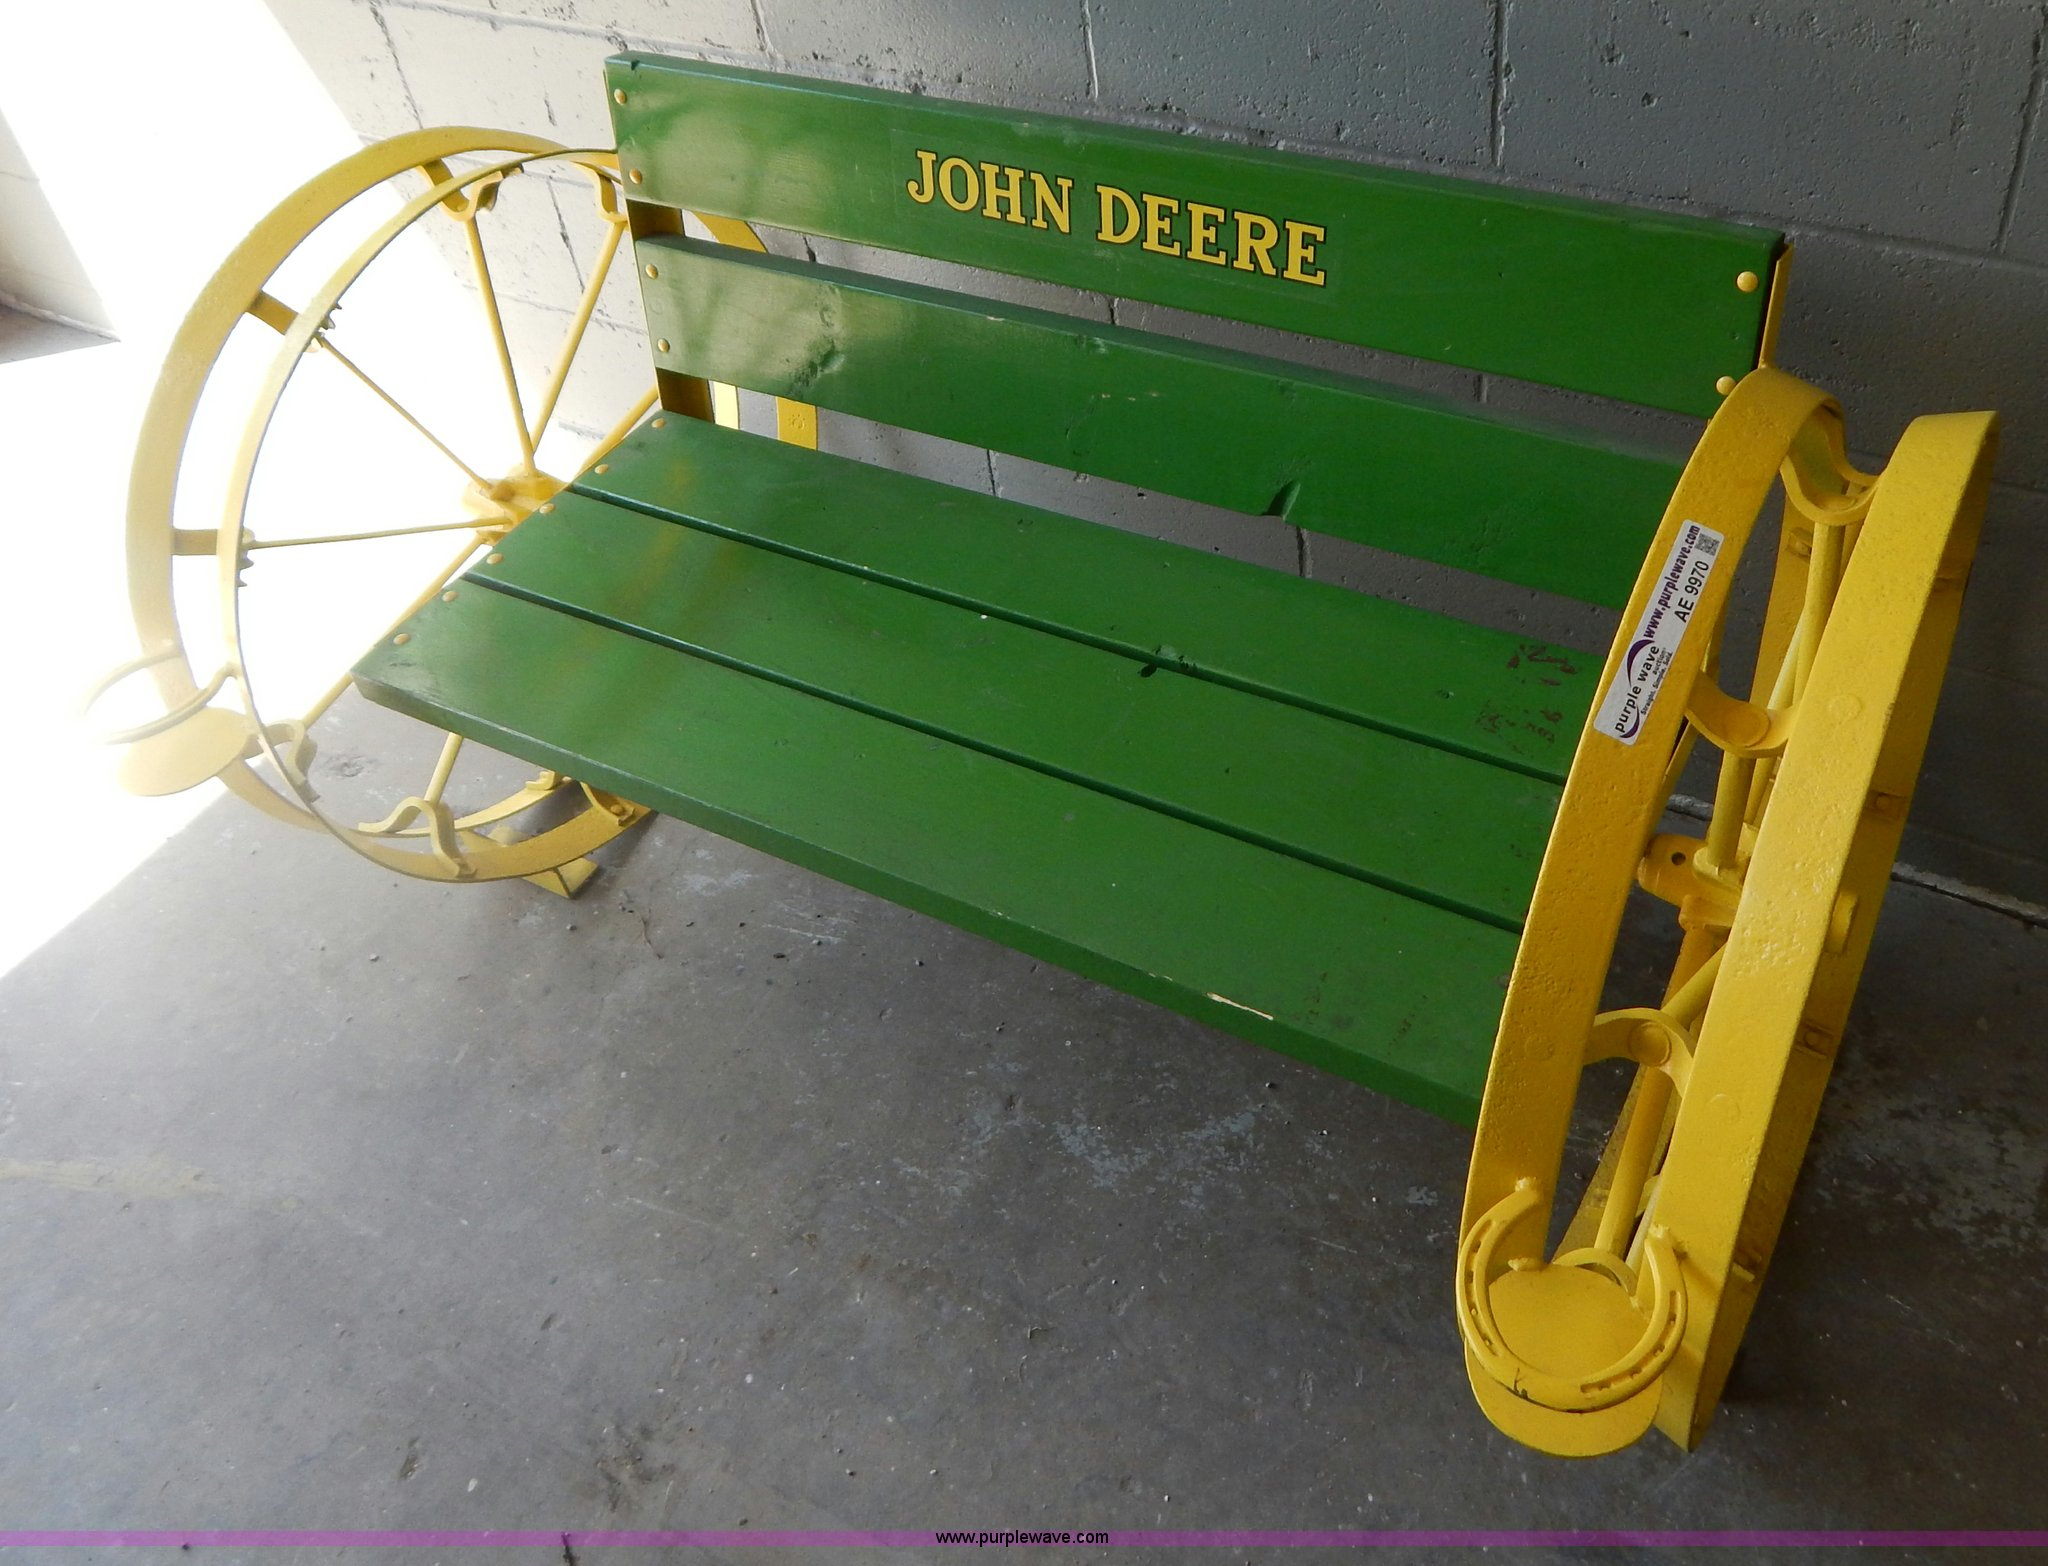 John Deere Gifts >> Shop Built John Deere Bench Item Ae9970 Sold May 29 Mid